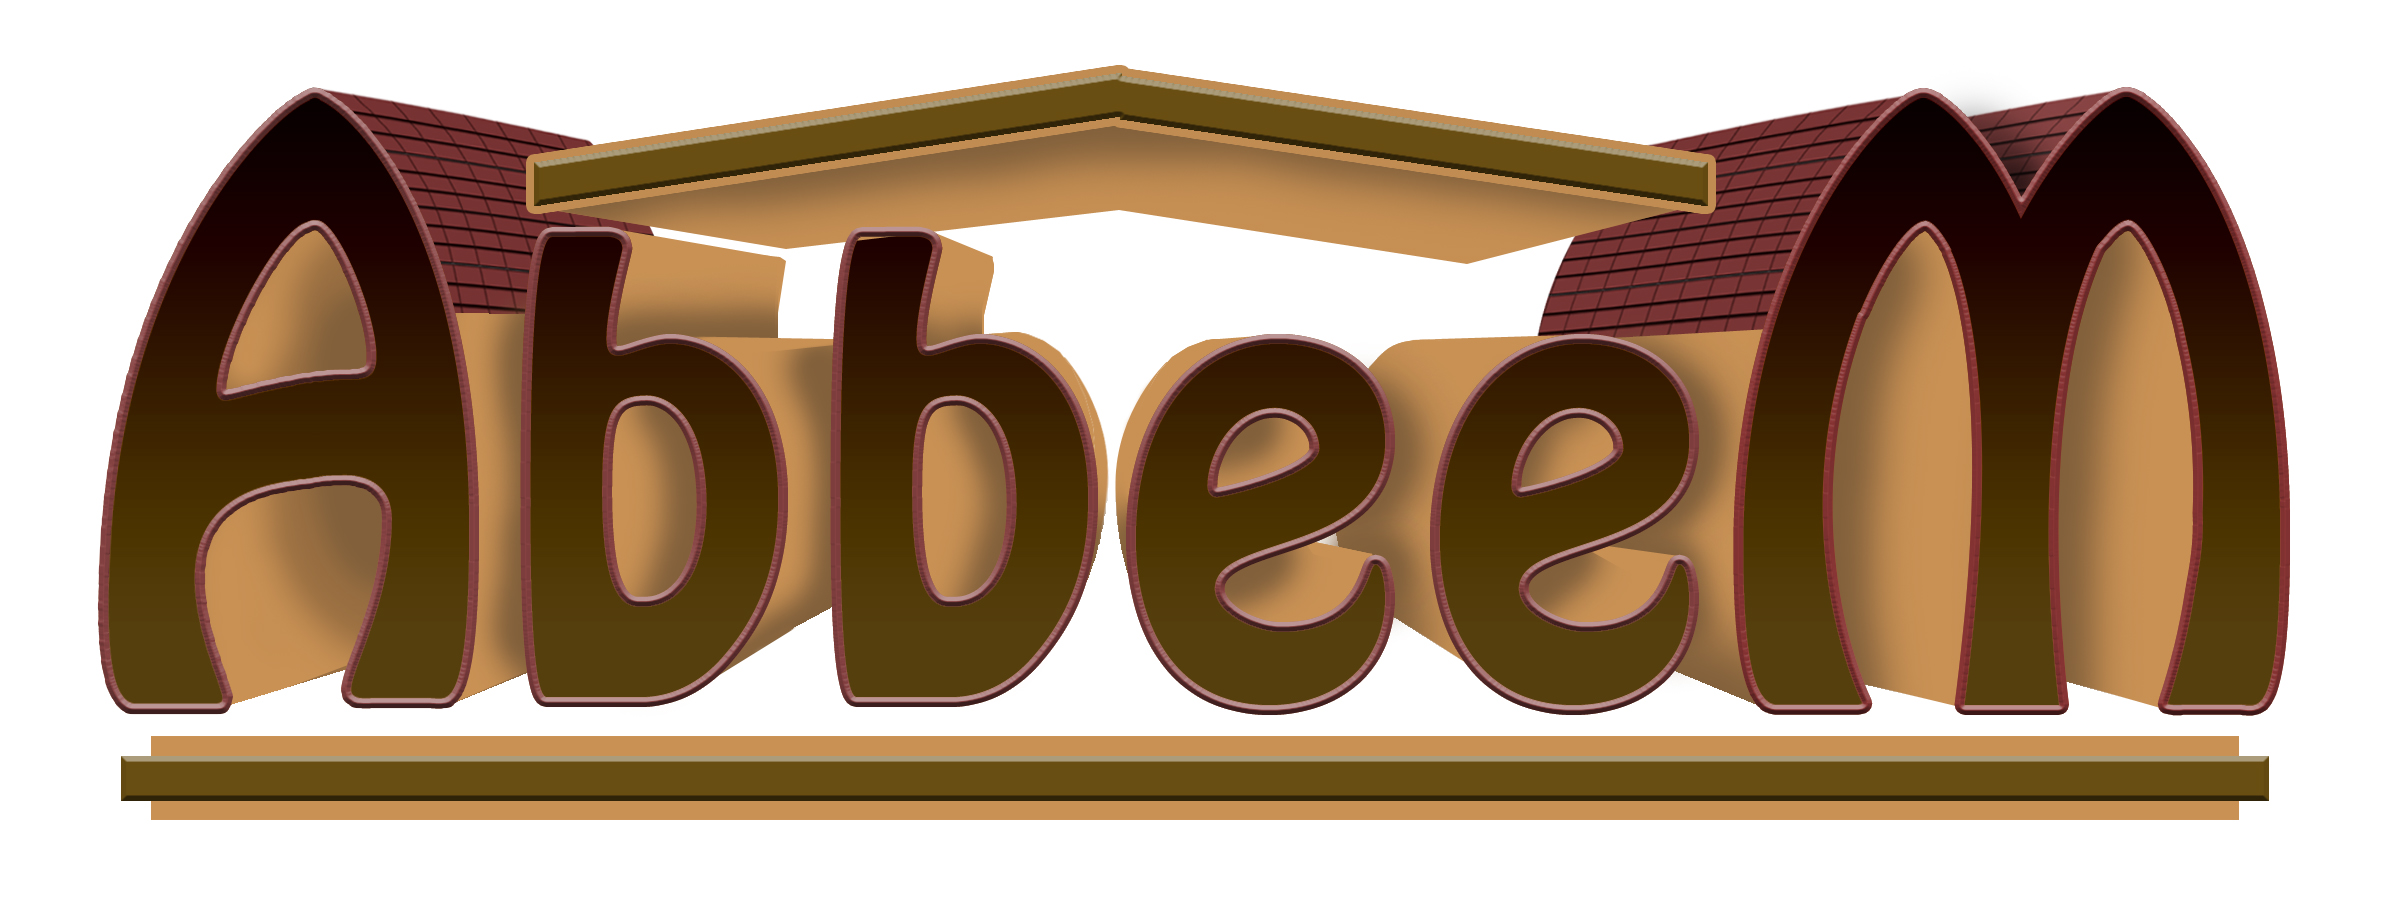 Logo Design by Kitz Malinao - Entry No. 80 in the Logo Design Contest Luxury Logo Design for Abbeem.